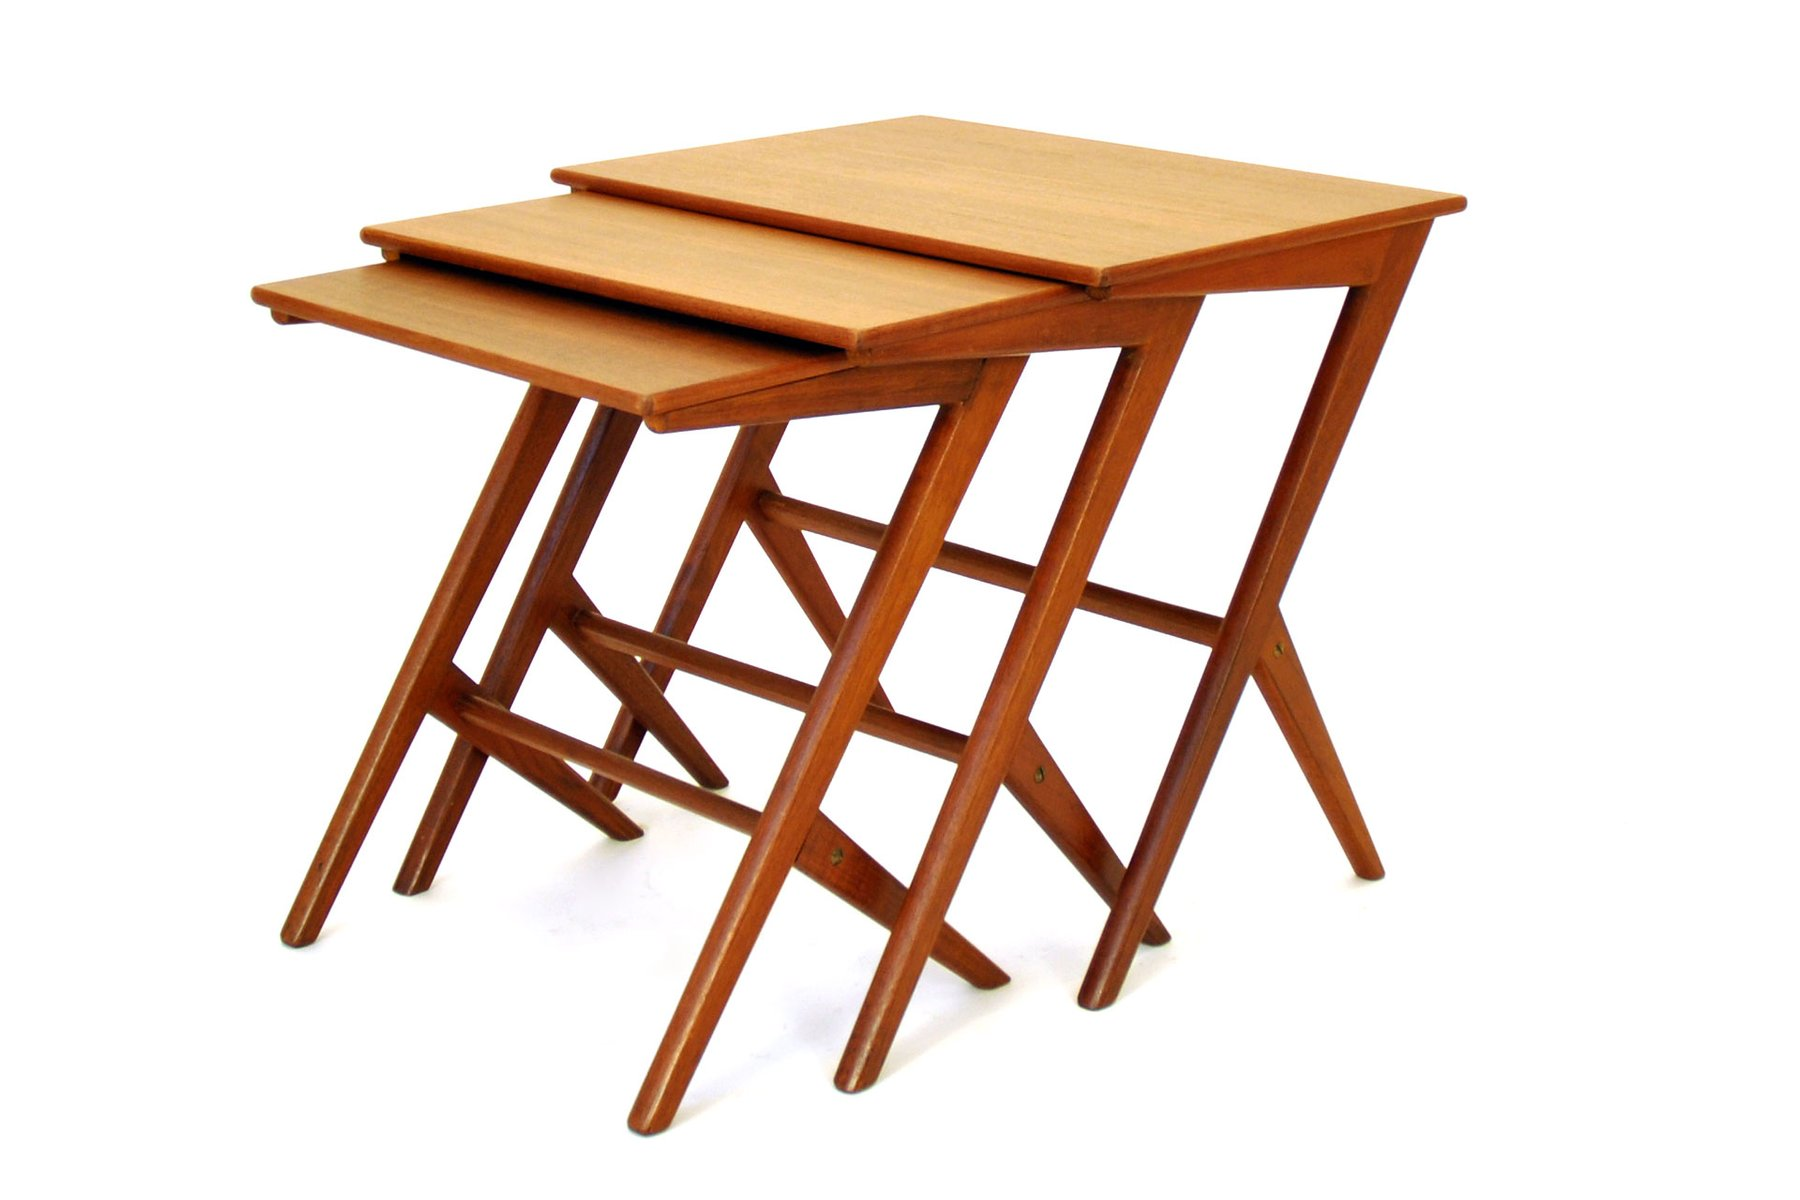 Danish Nesting Tables By Bengt Ruda, 1950s